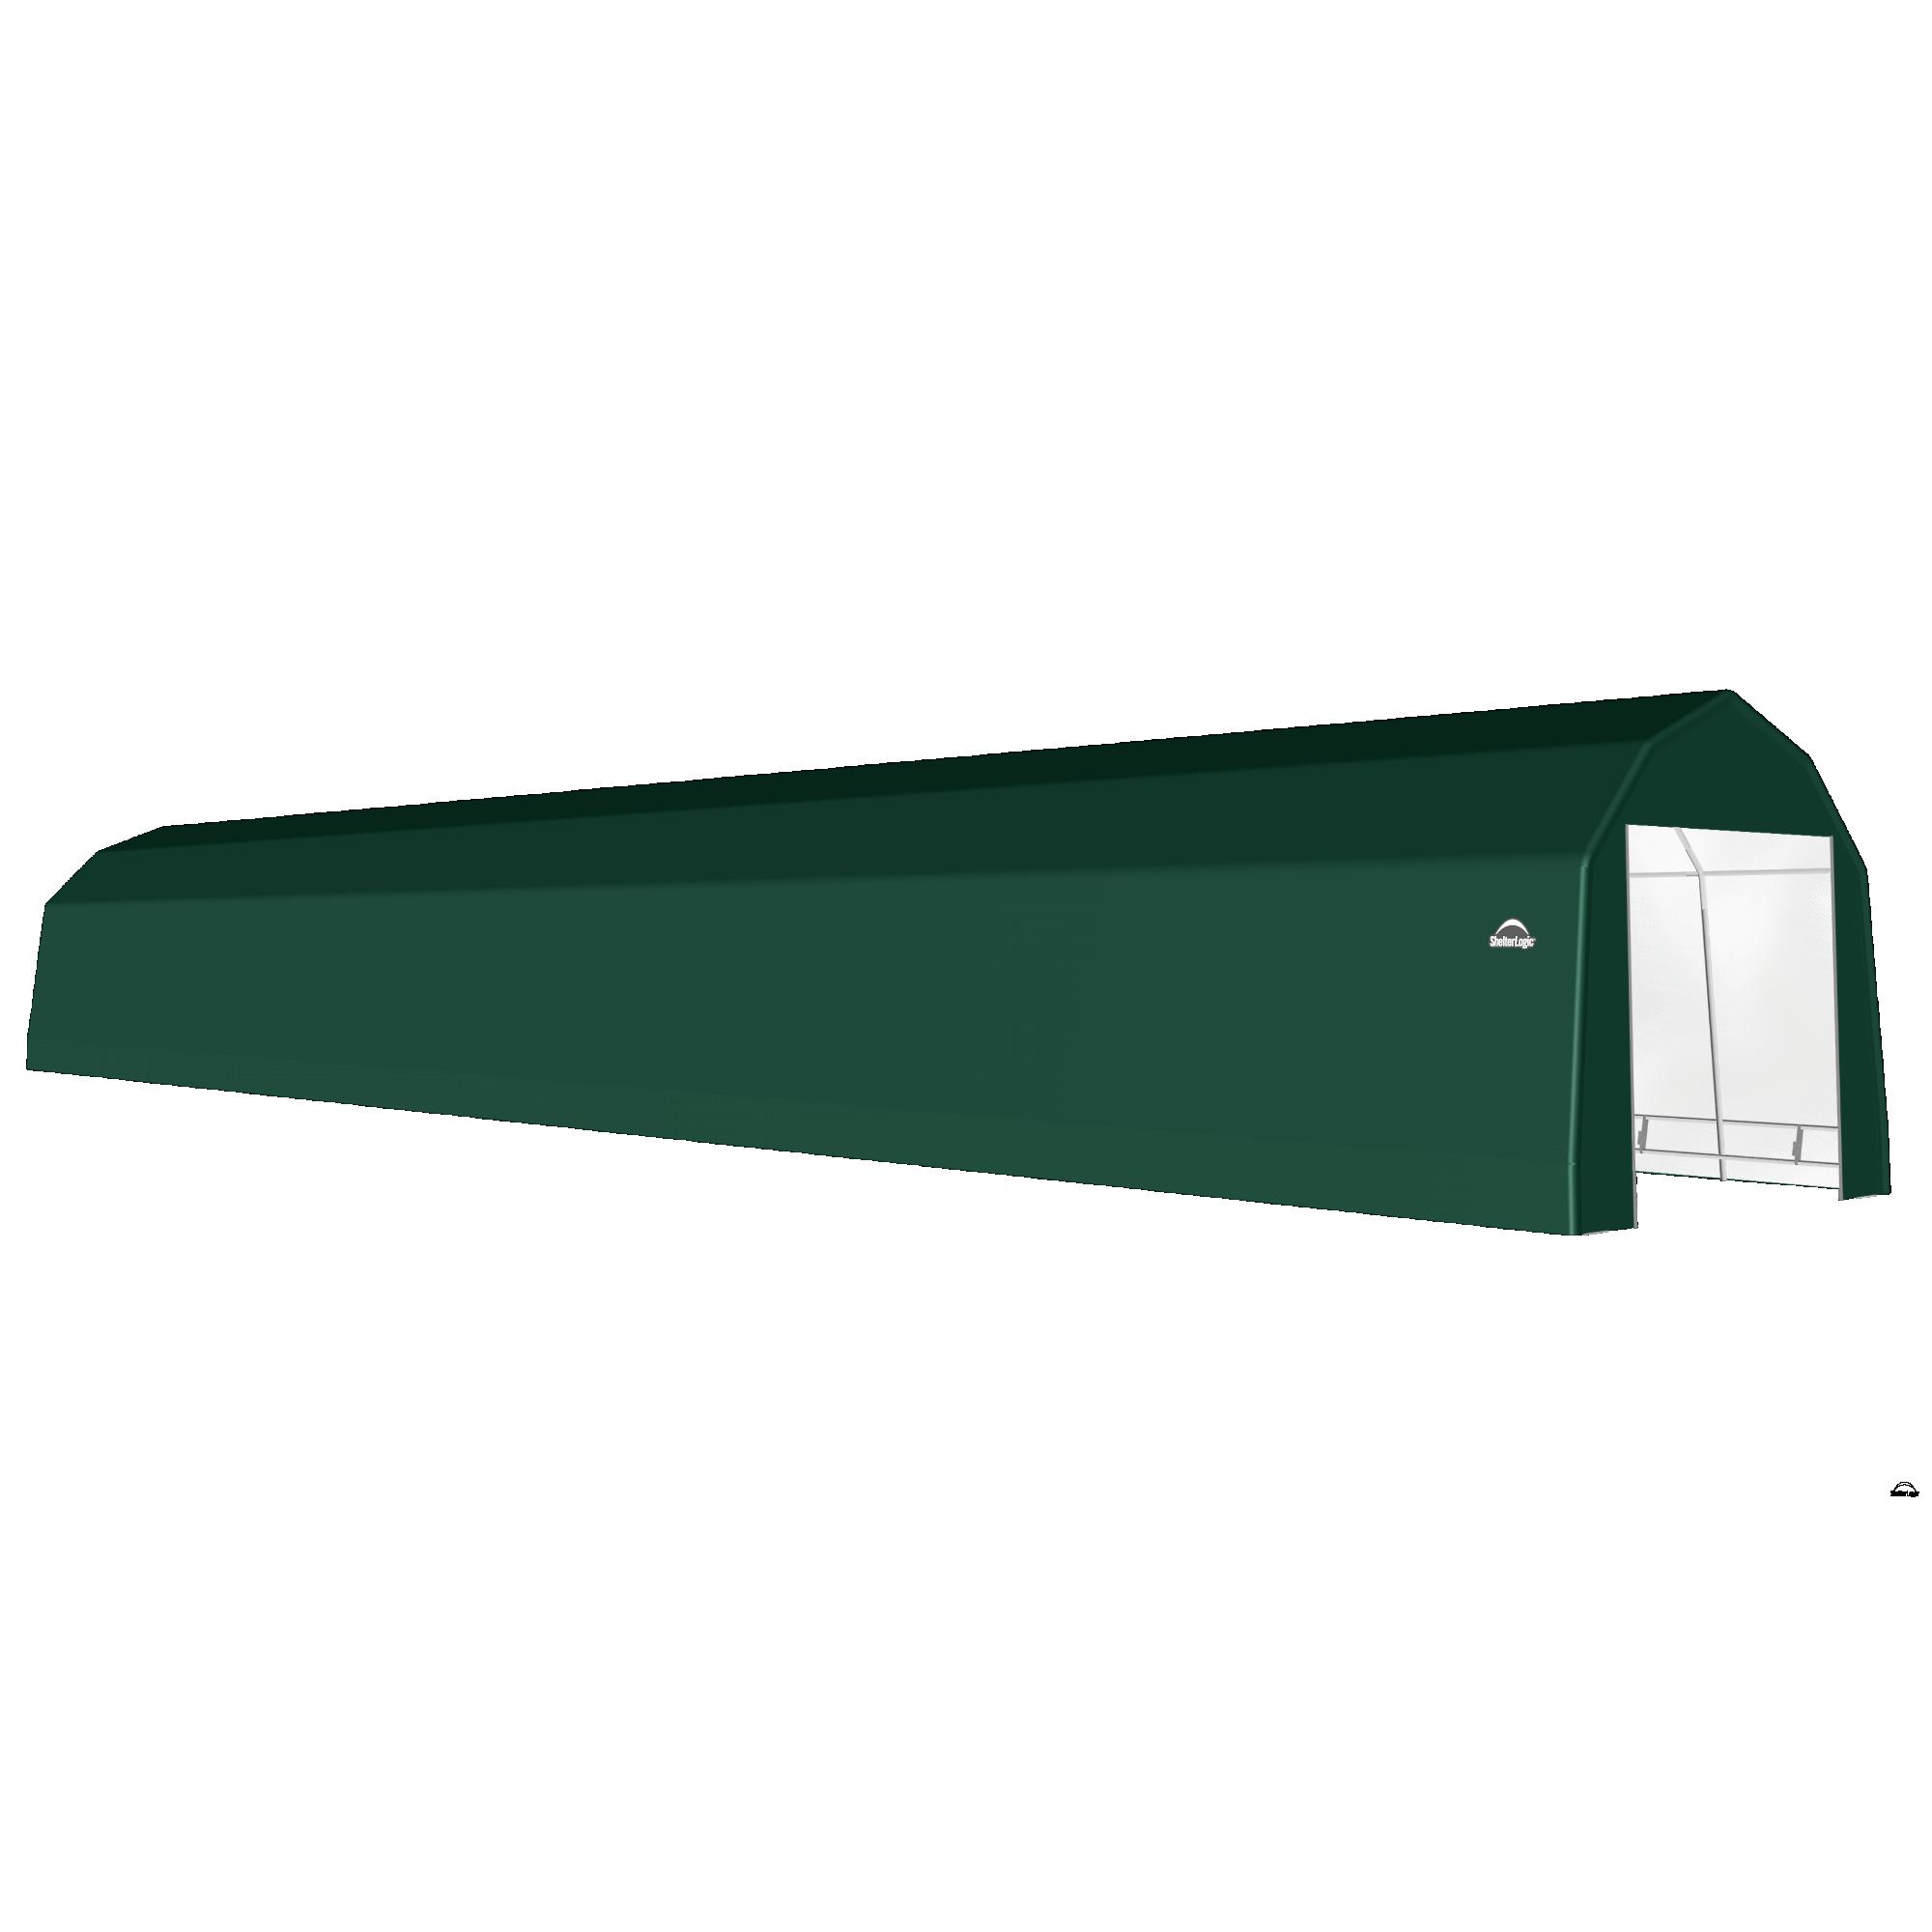 SP Barn 12X76X11 Green 14 oz PE Shelter